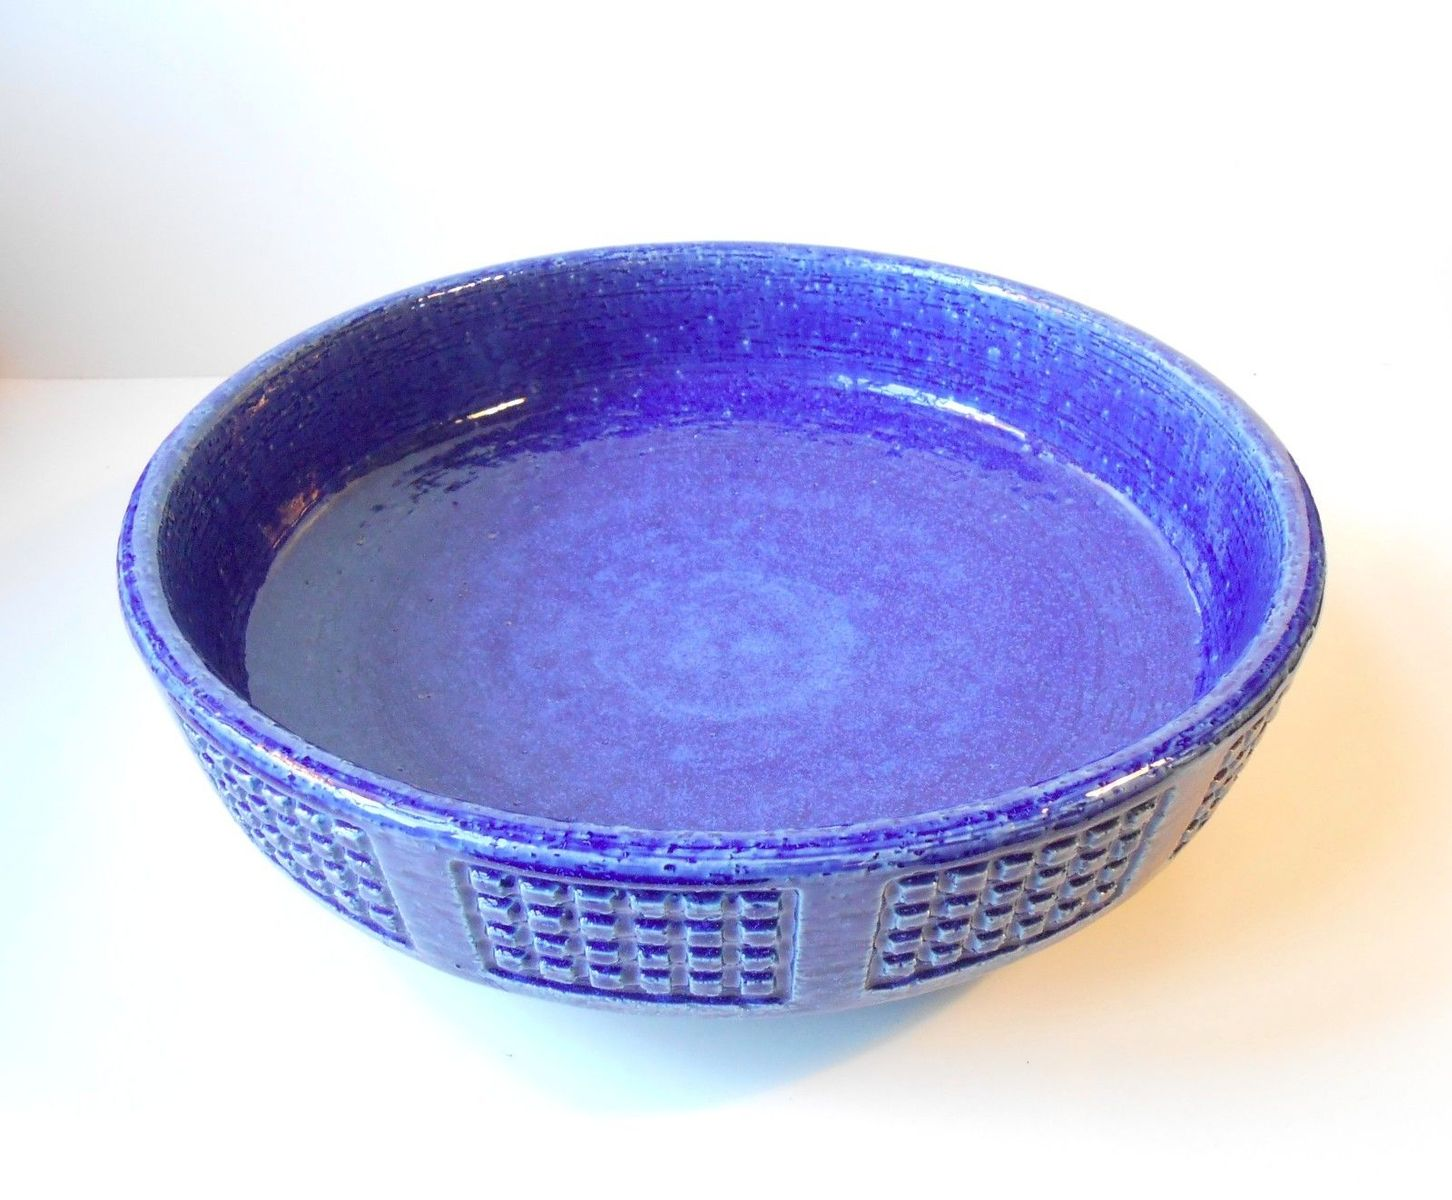 Blue centerpiece ceramic bowl by per linnemann schmidt for